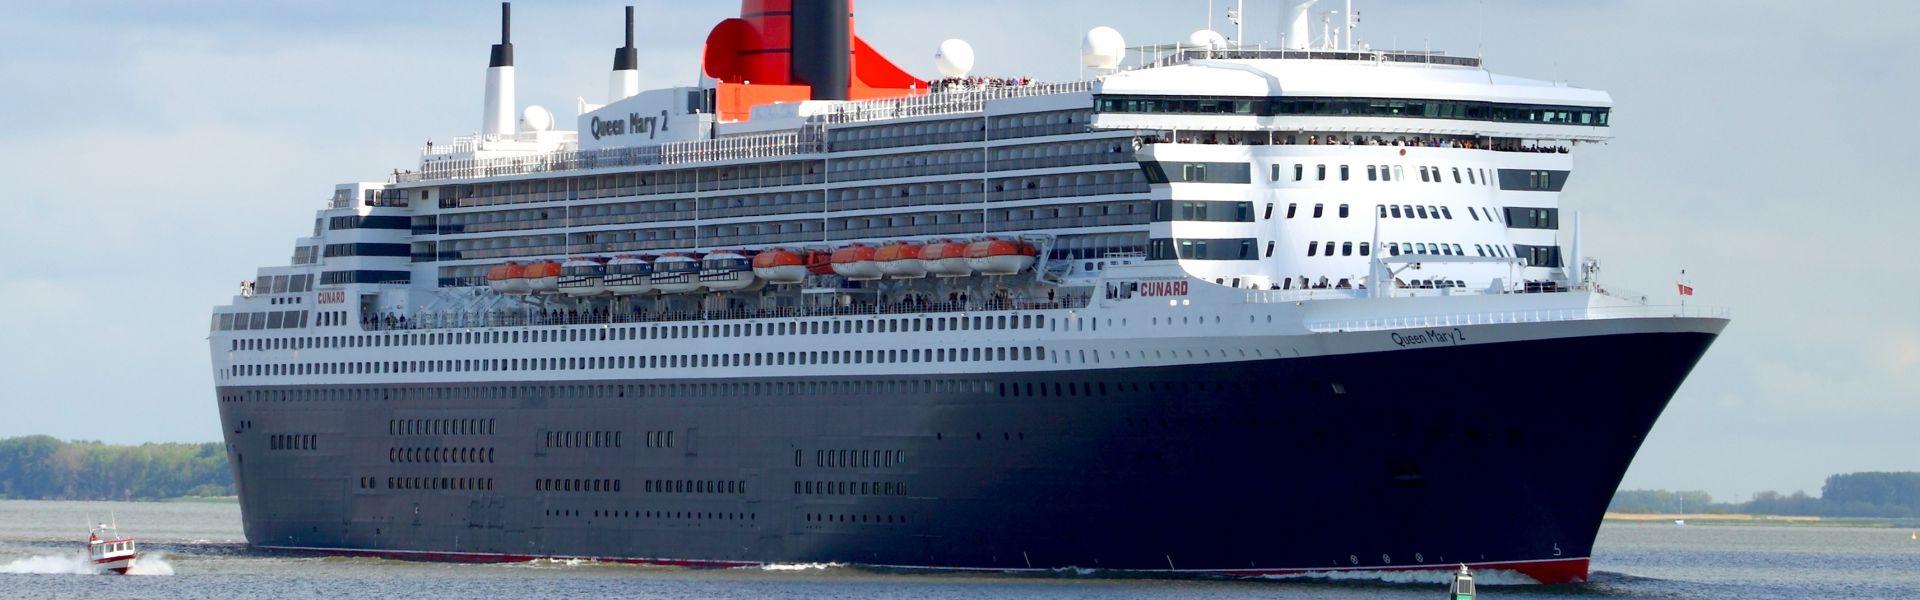 Croaziera 2019 - Repozitionari (Southampton) - Cunard Line - Queen Mary 2 - 19 nopti